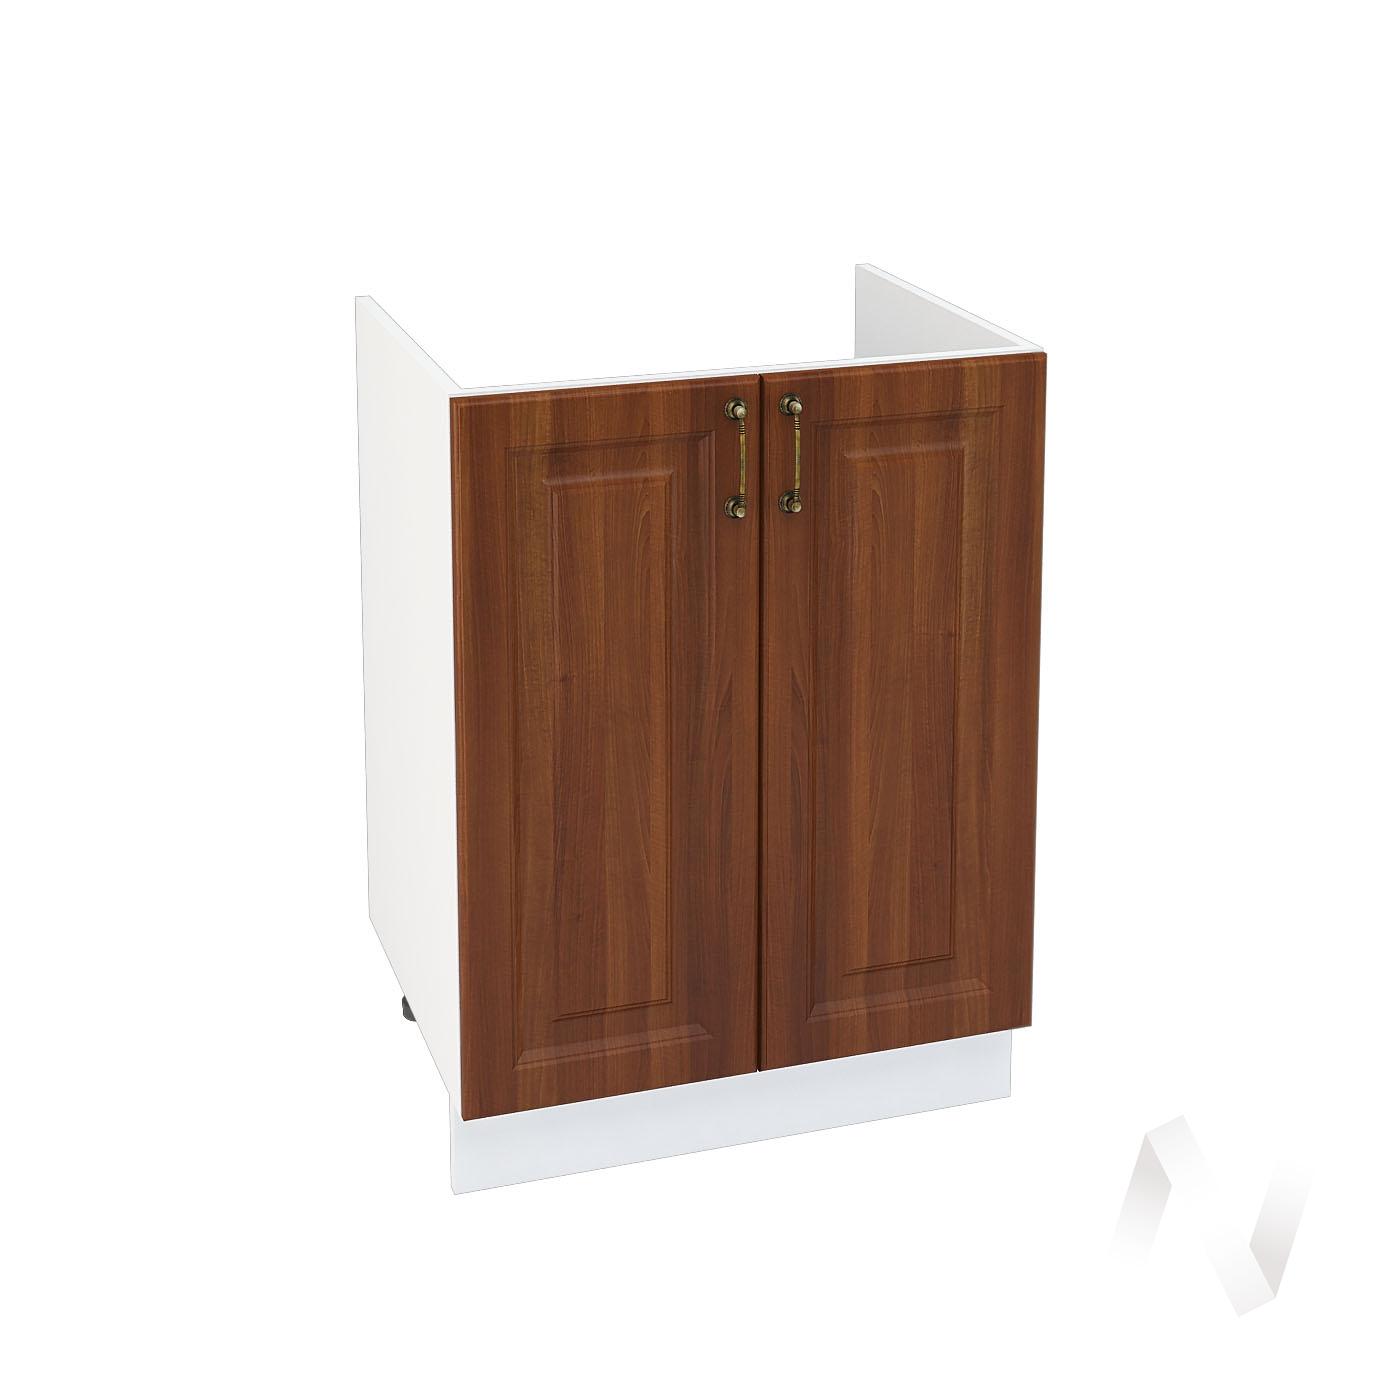 "Кухня ""Ницца"": Шкаф нижний под мойку 600, ШНМ 600 (Орех/корпус белый)"